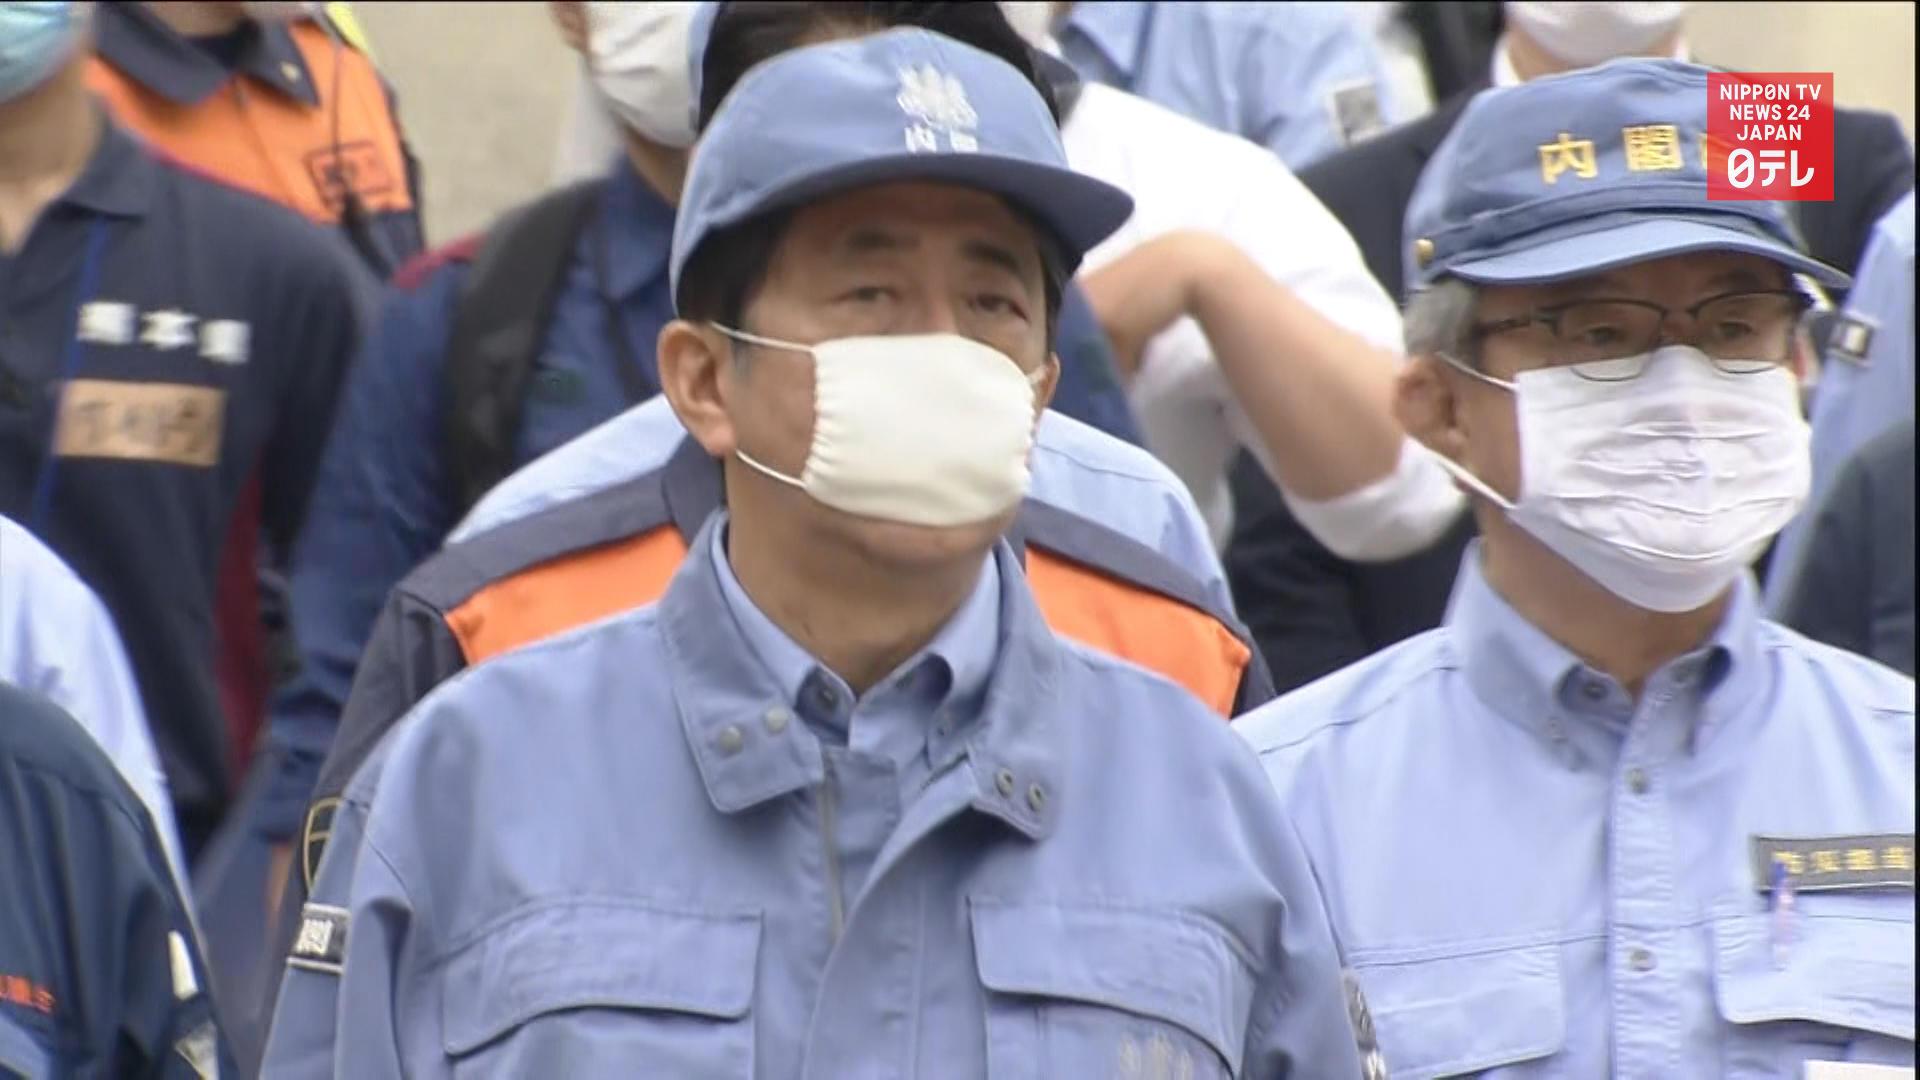 Japan PM vows aid to rain-battered Kumamoto